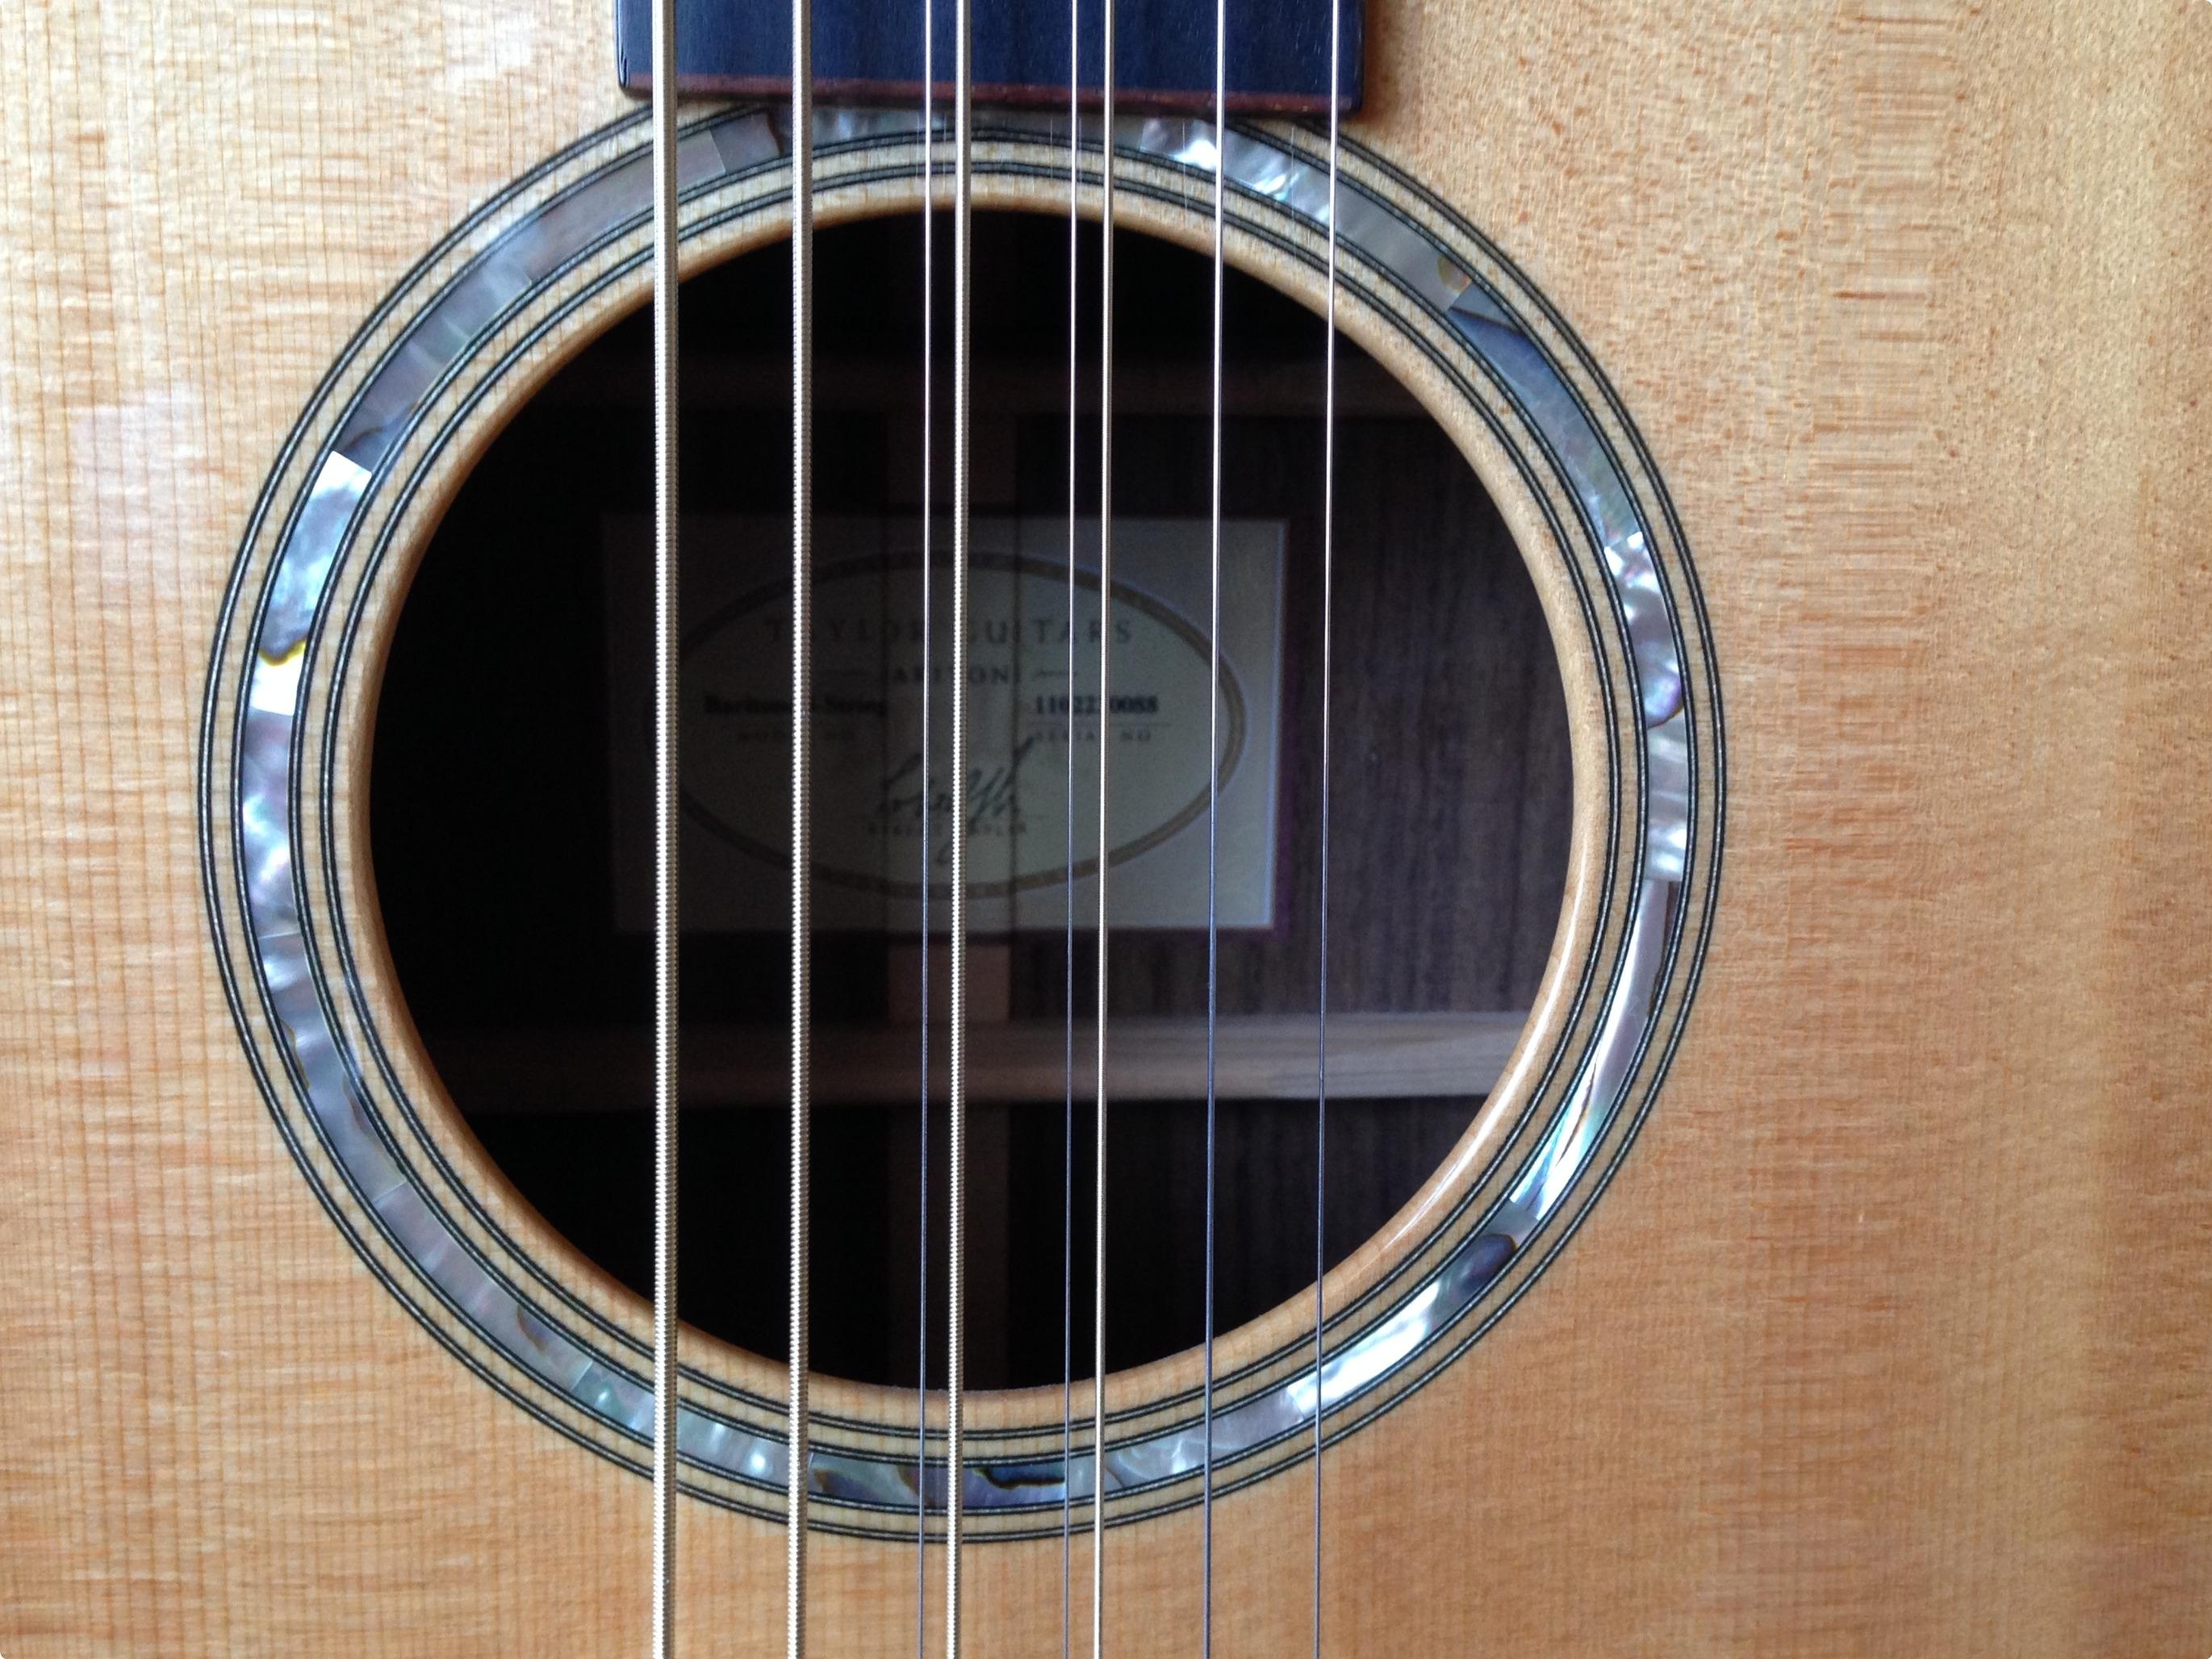 taylor baritone 8 2010 glossy natural guitar for sale. Black Bedroom Furniture Sets. Home Design Ideas